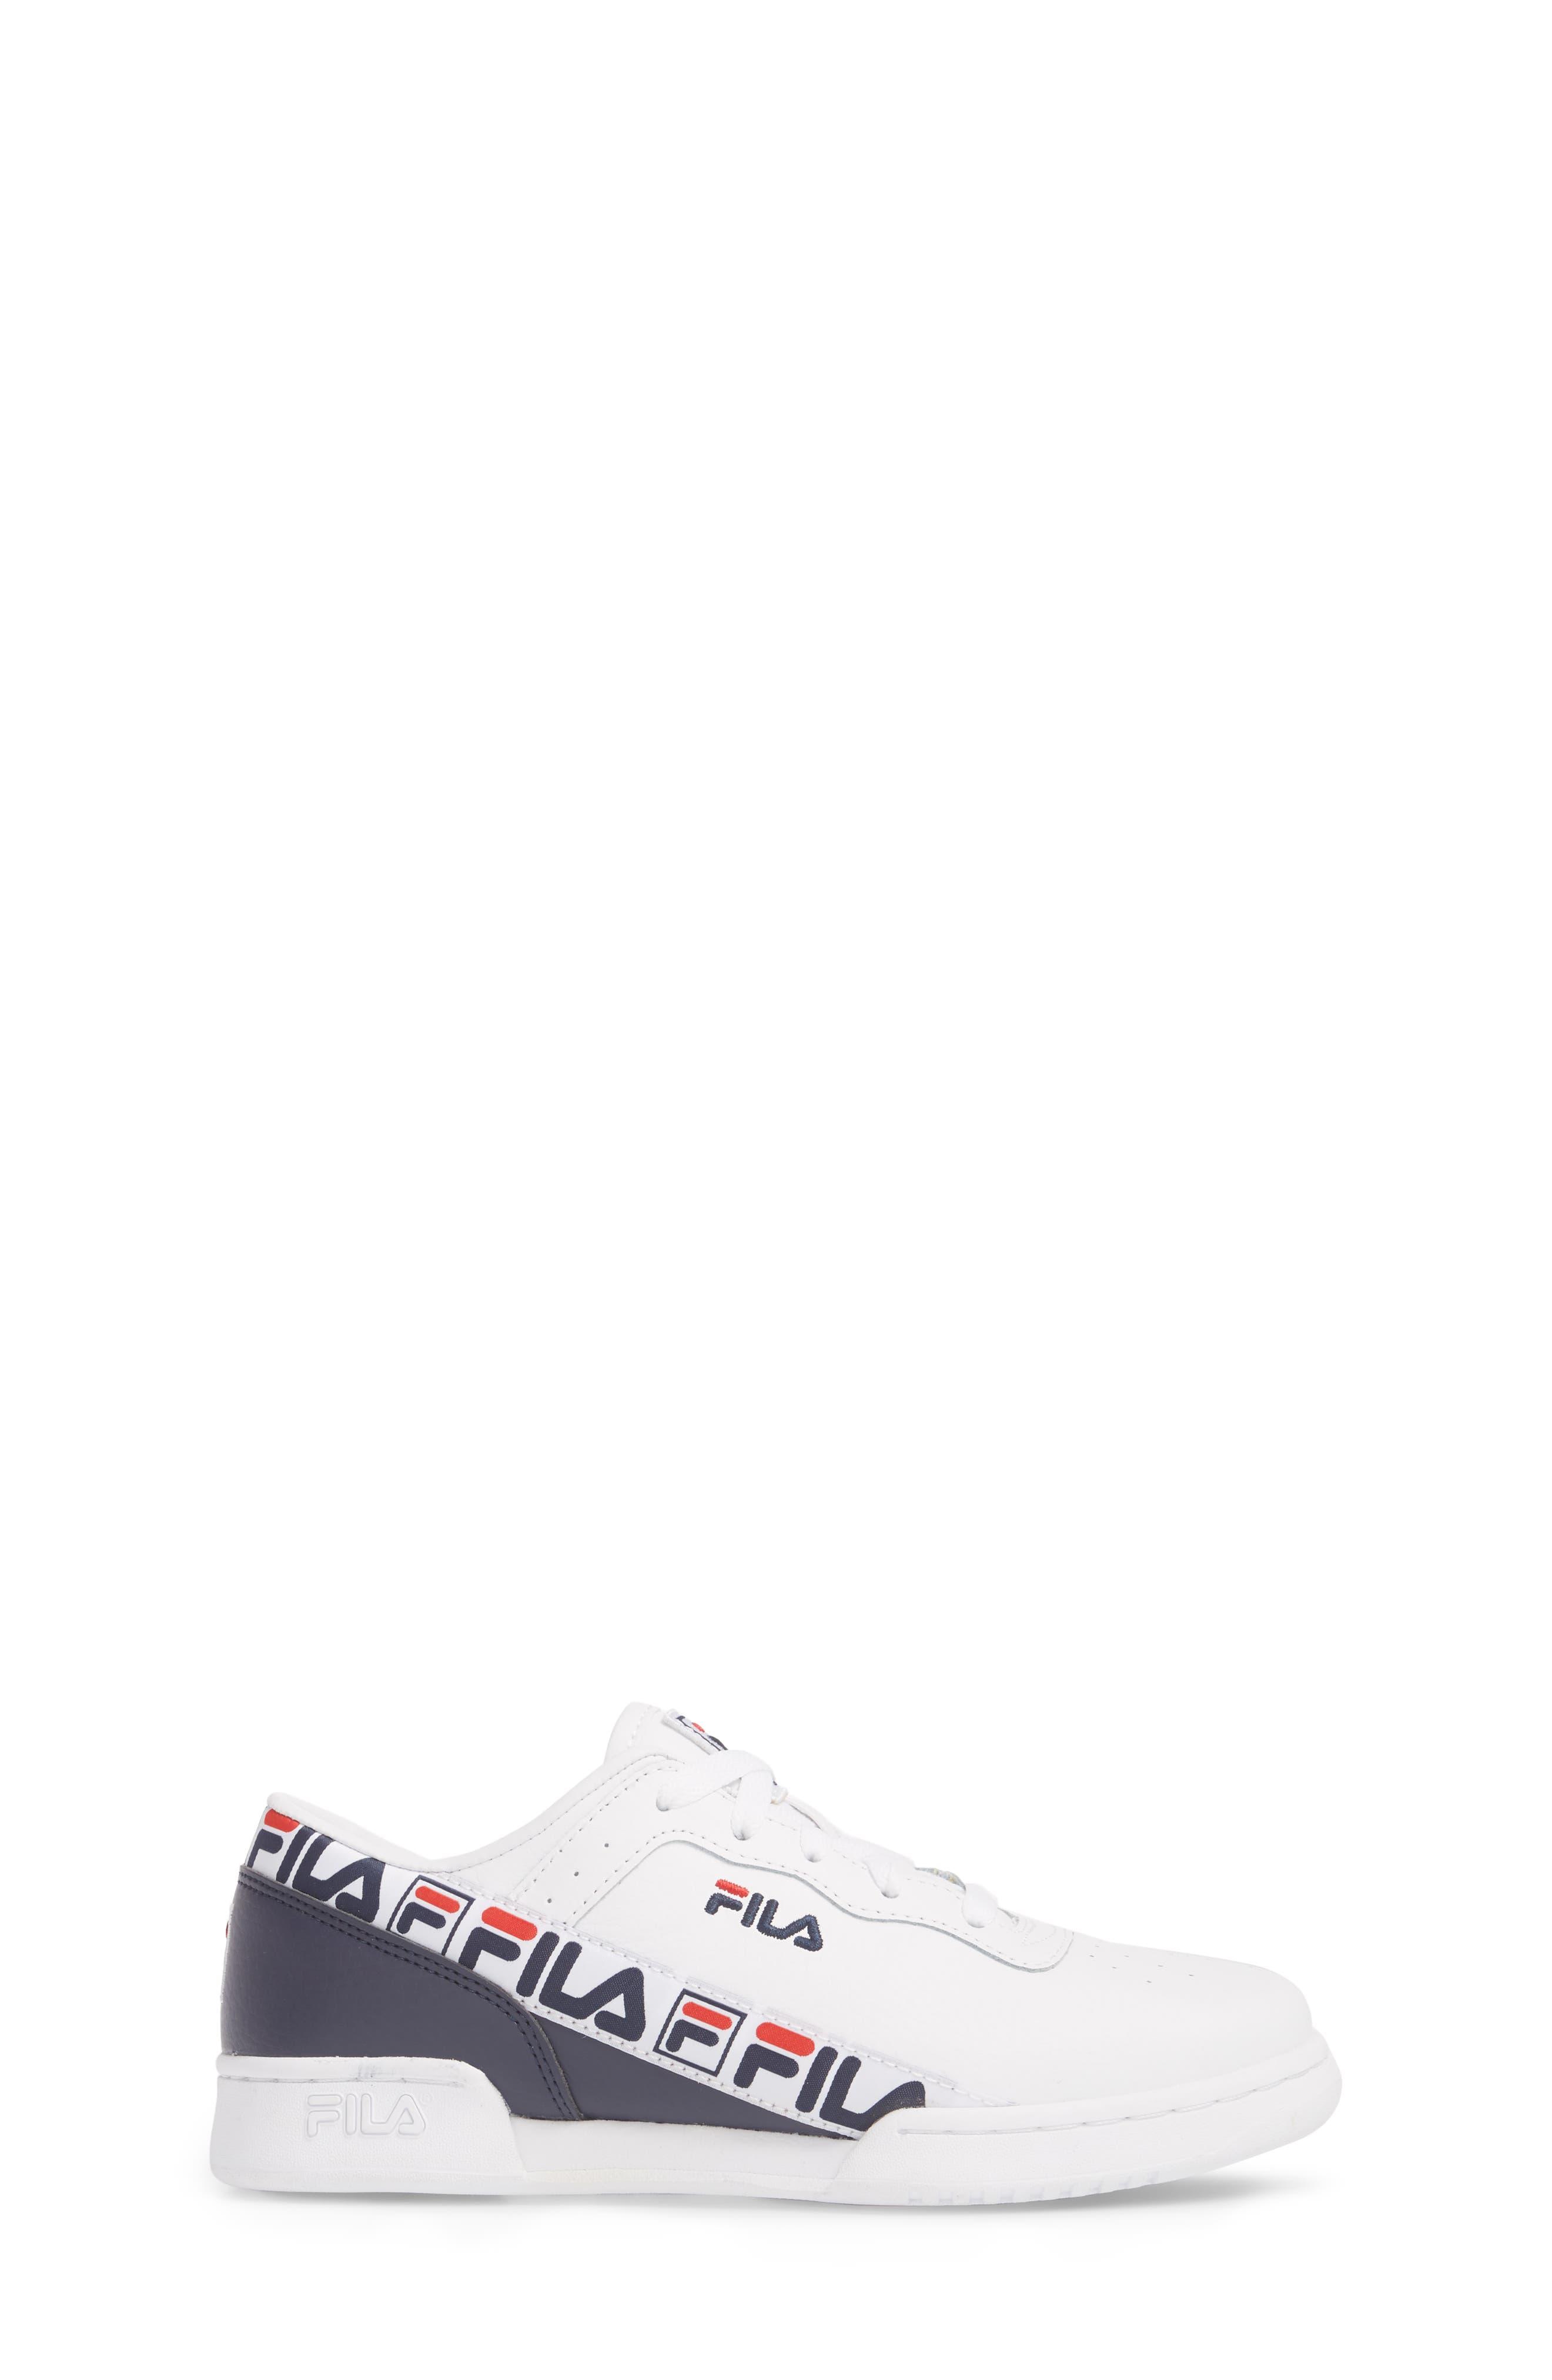 FILA, Original Fitness Logo Tape Sneaker, Alternate thumbnail 3, color, WHITE/ FILA NAVY